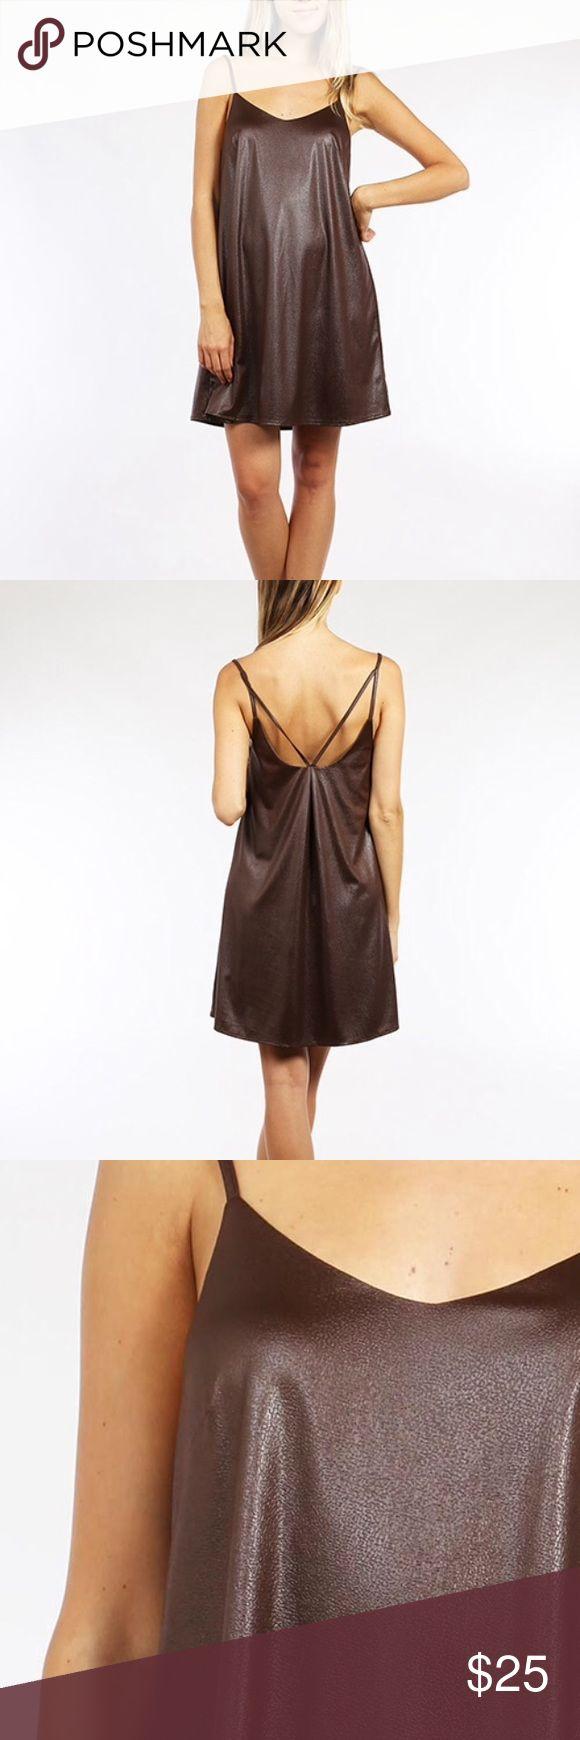 Cami dress Beautiful brown cami dress - fabric looks like leather. Dresses